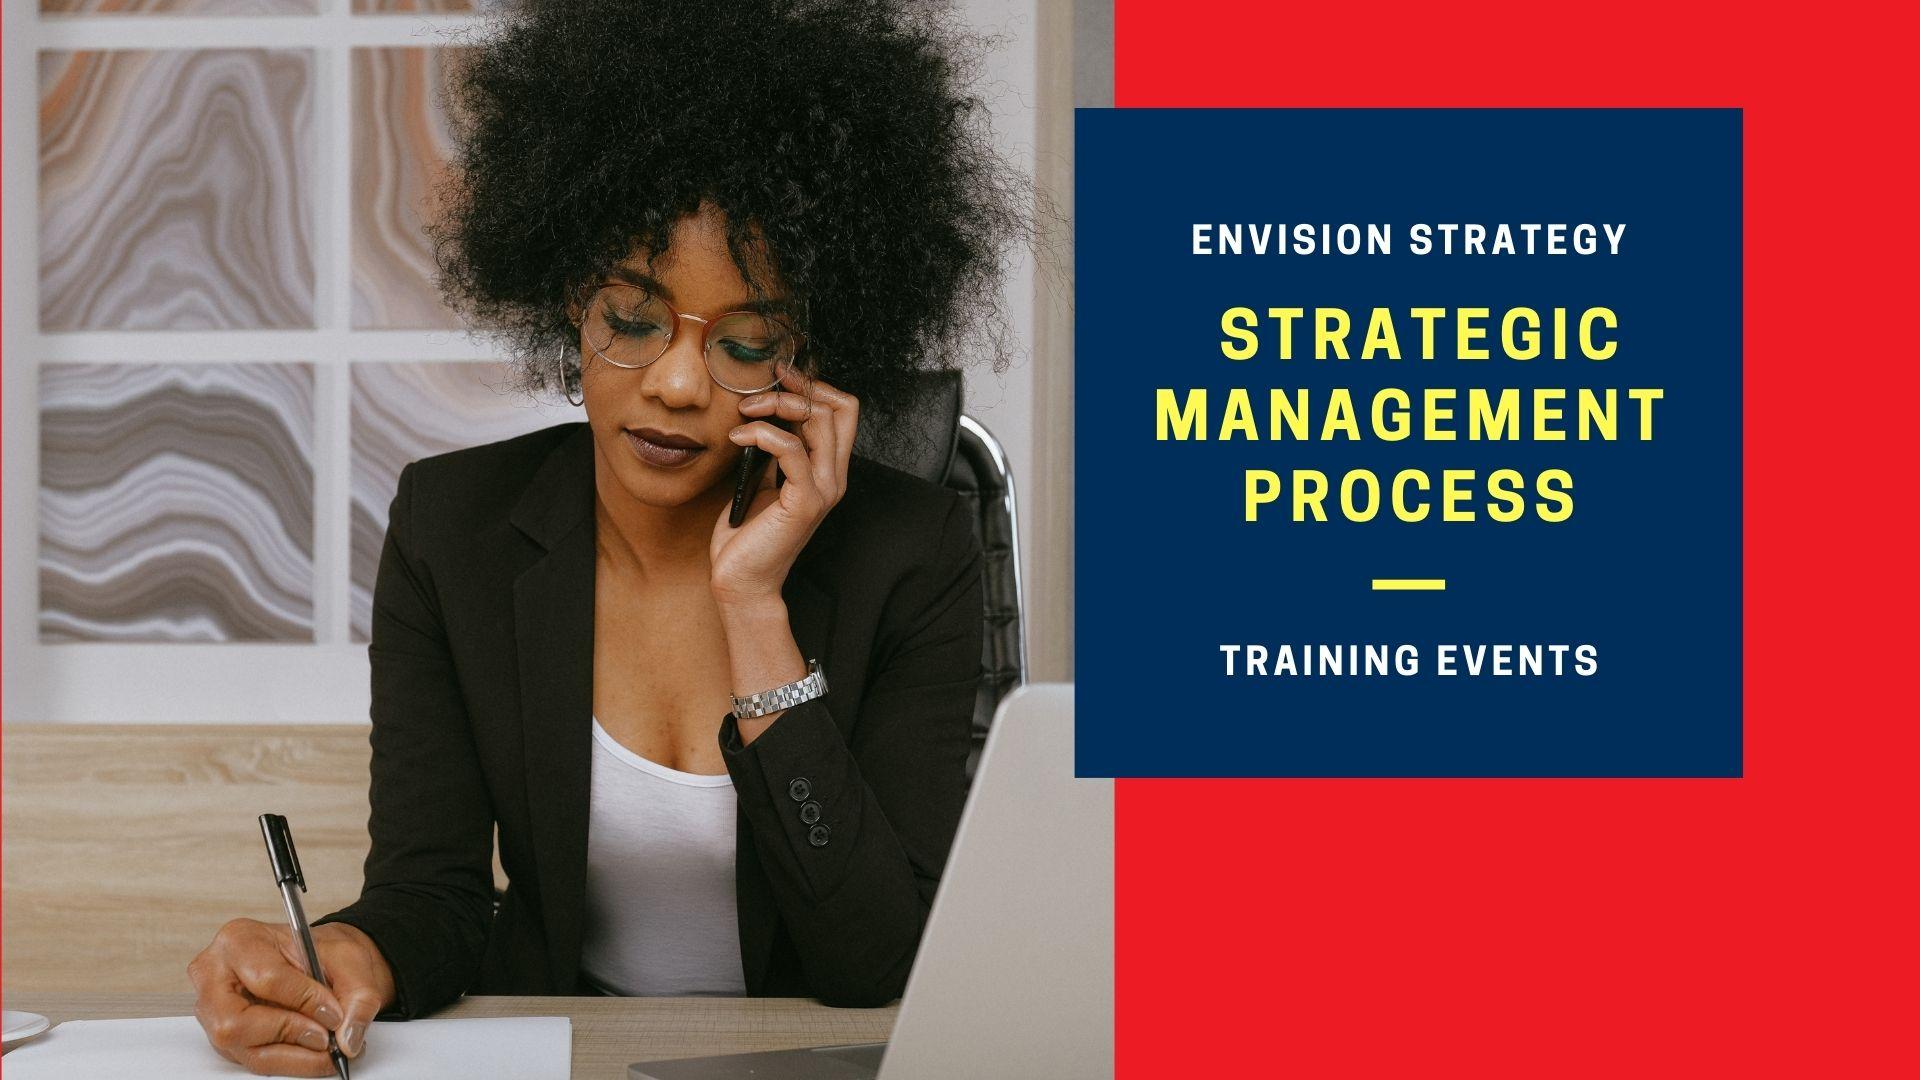 Strategic Management Process Training